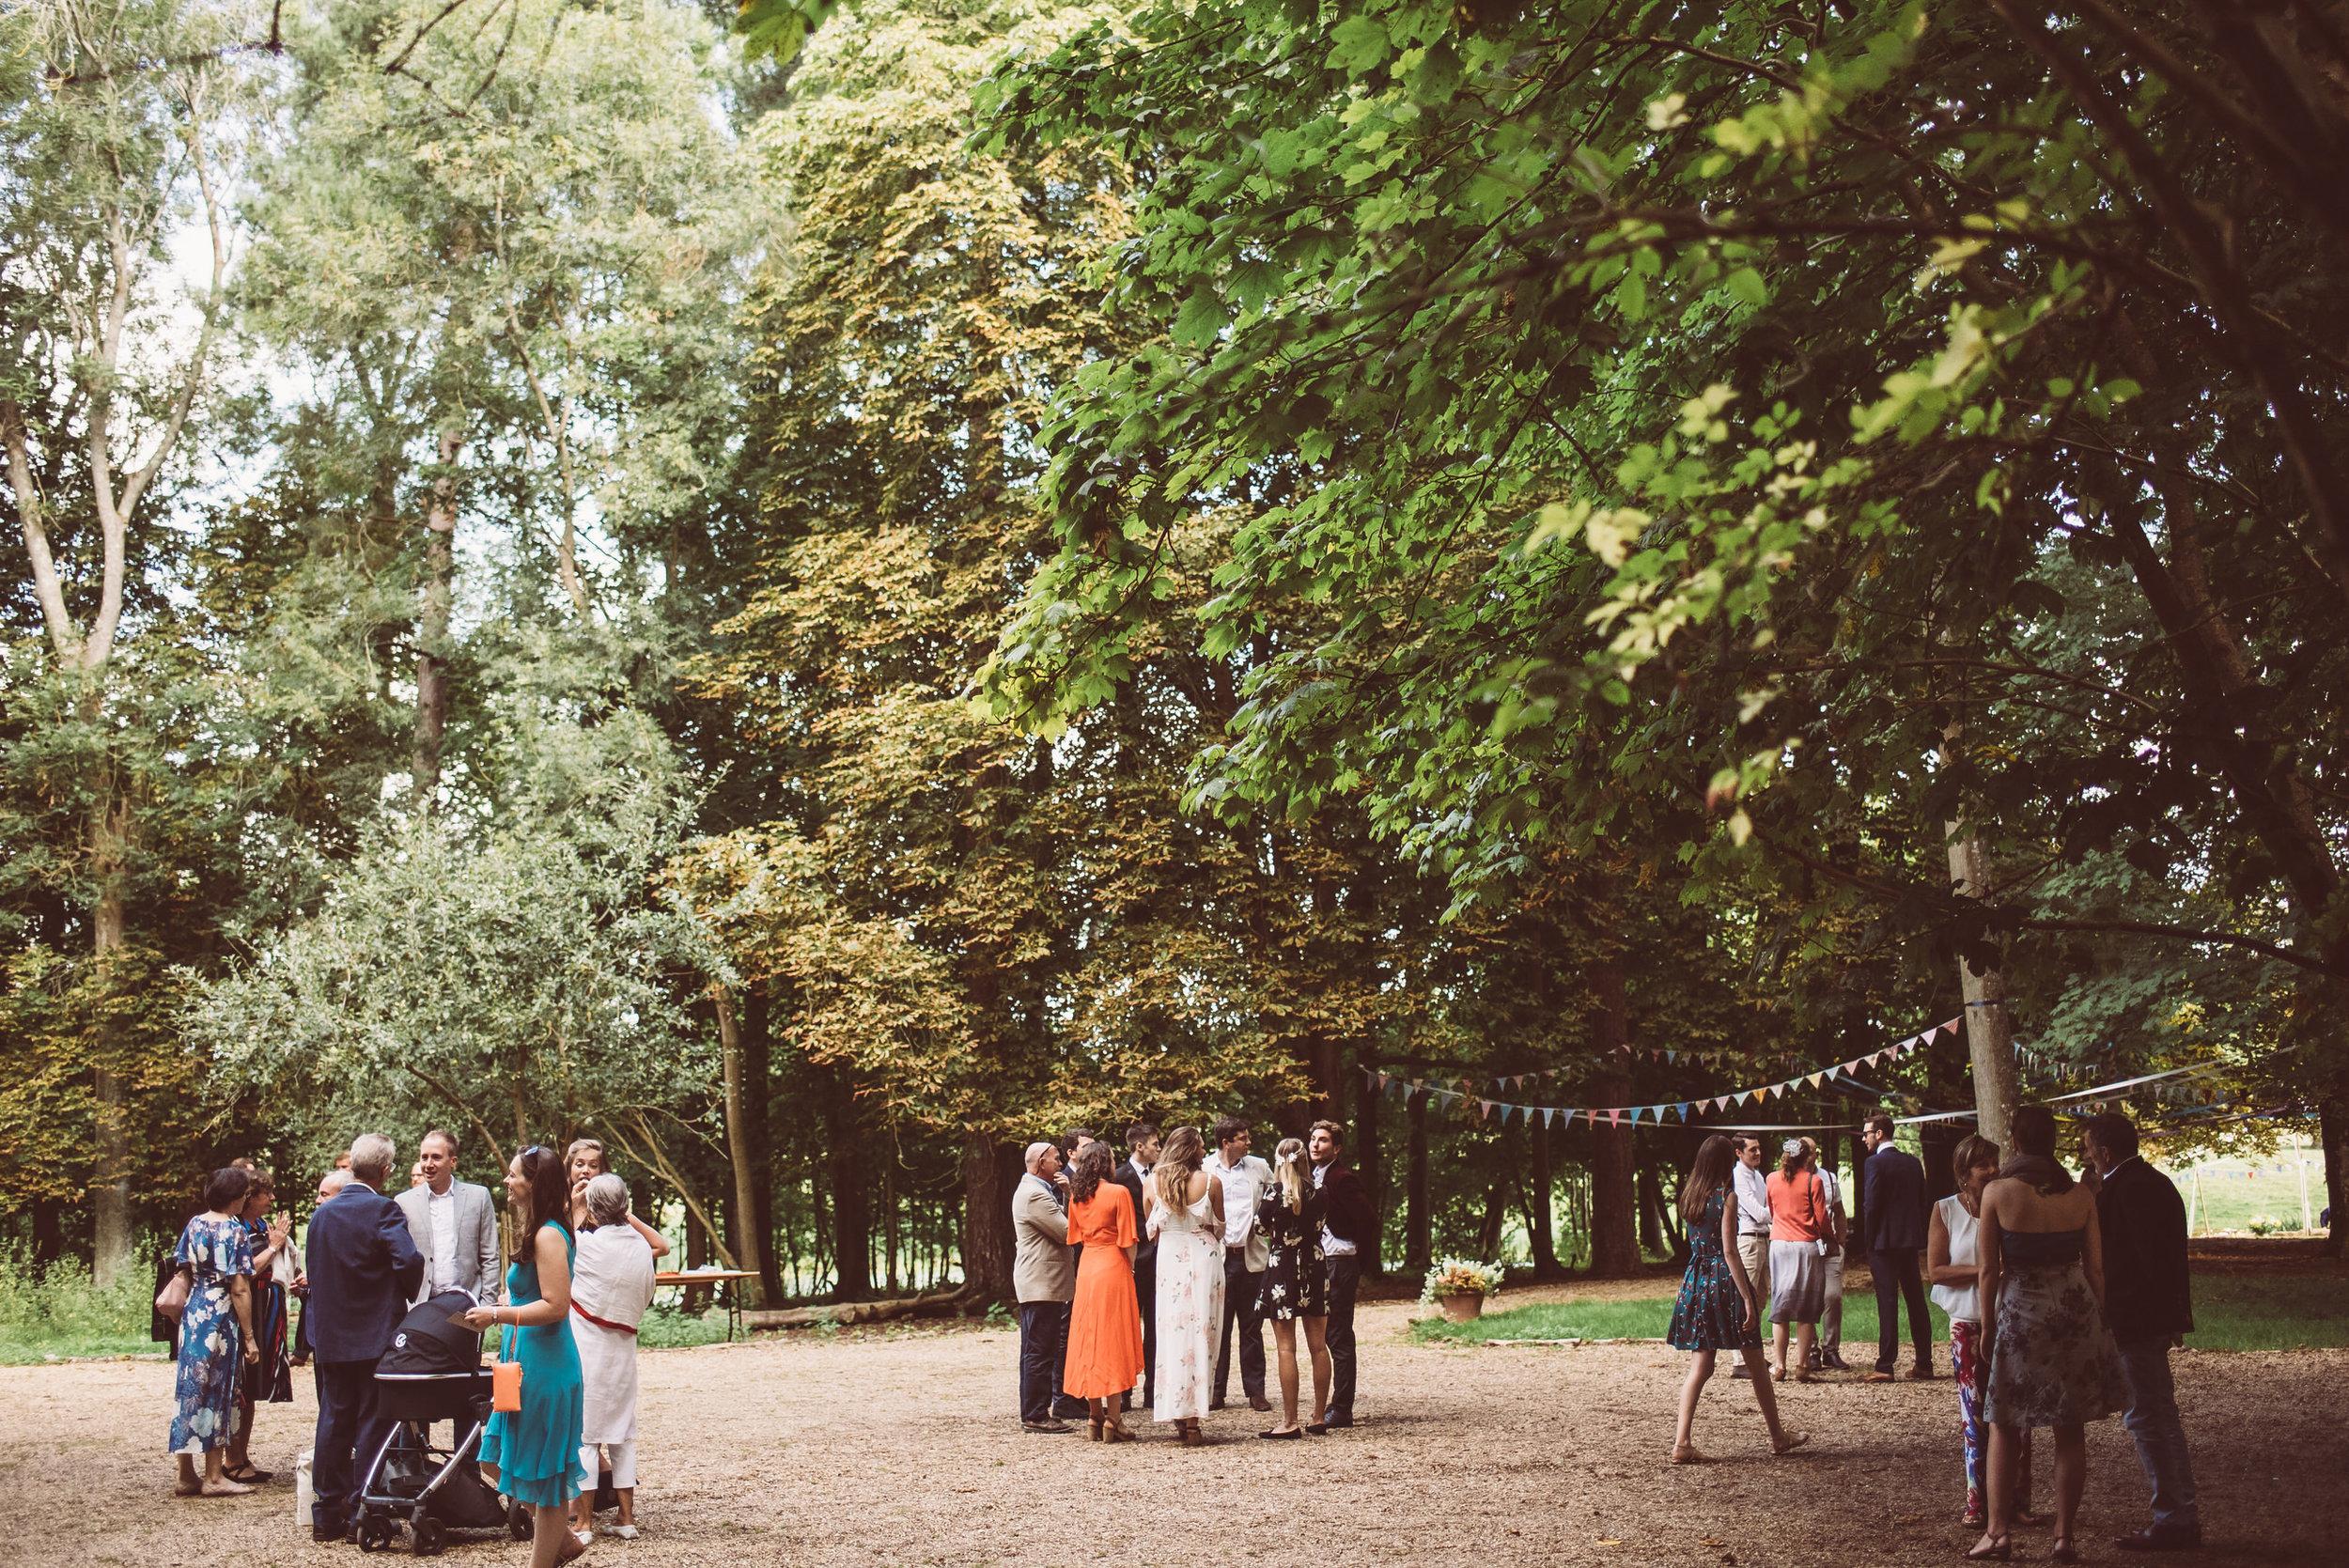 knepp-castle-boho-outdoor-wedding-83.jpg